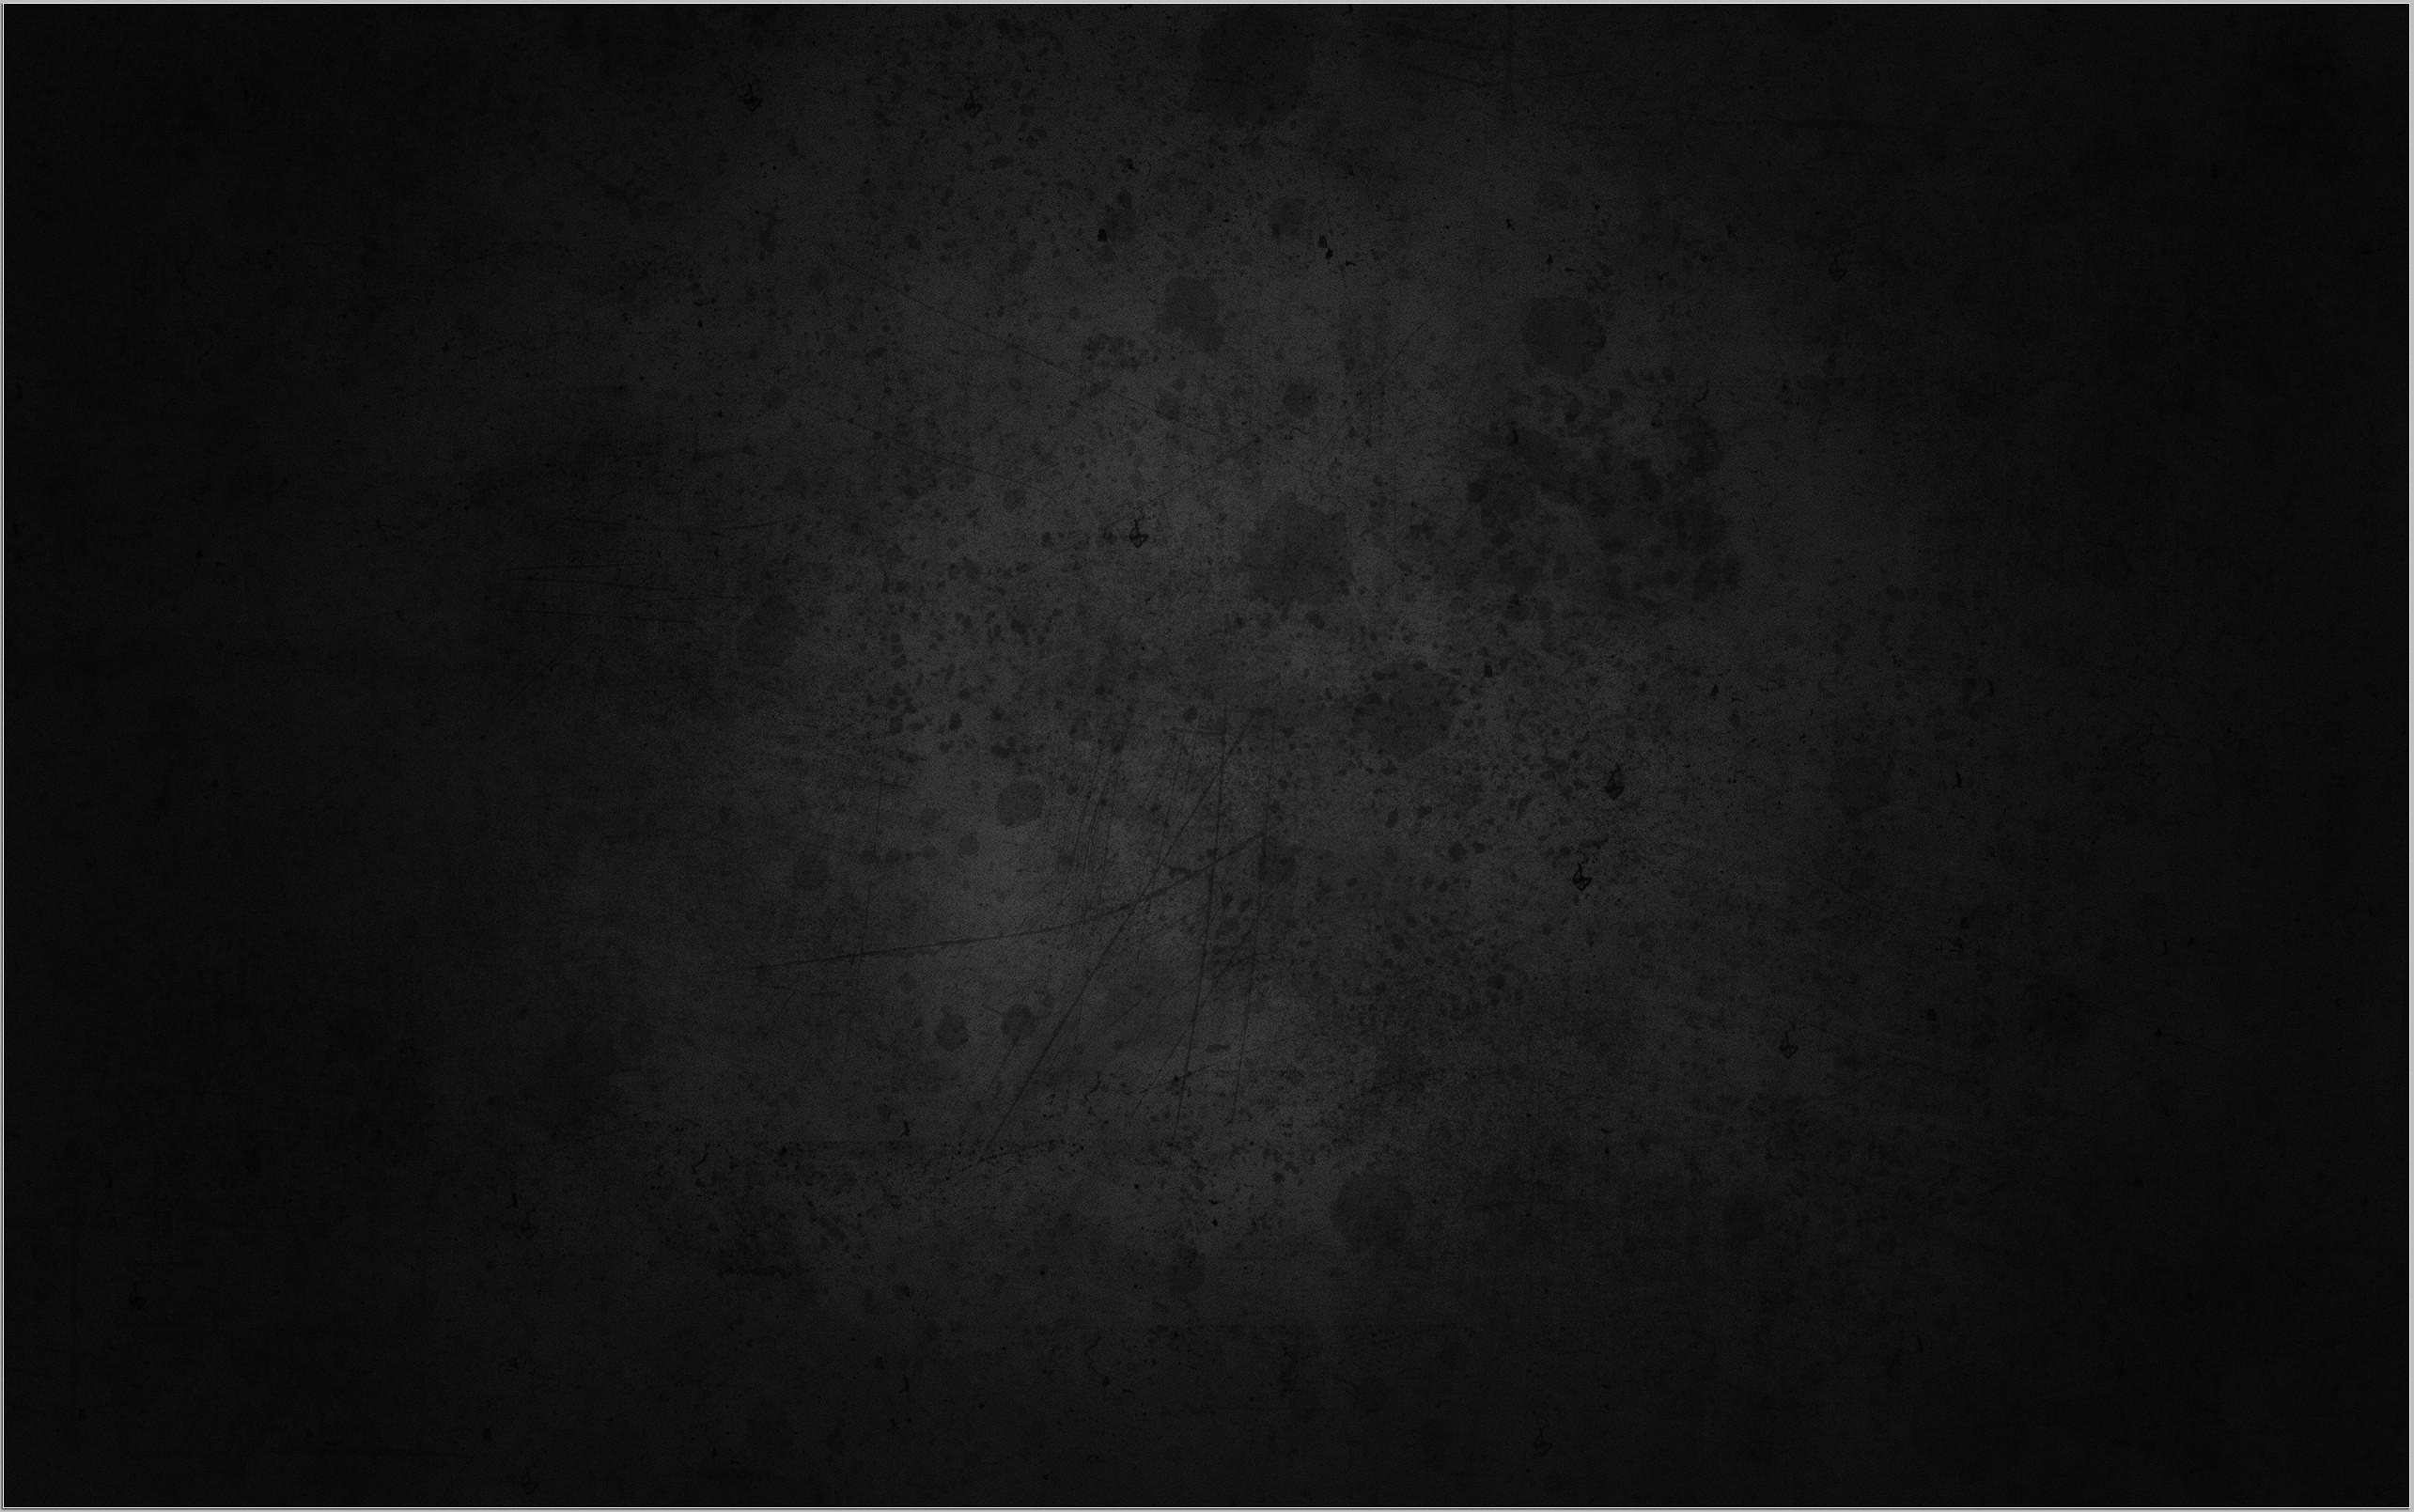 Dark Wallpaper 4k Black And White Iphone 6 Plus Wallpaper